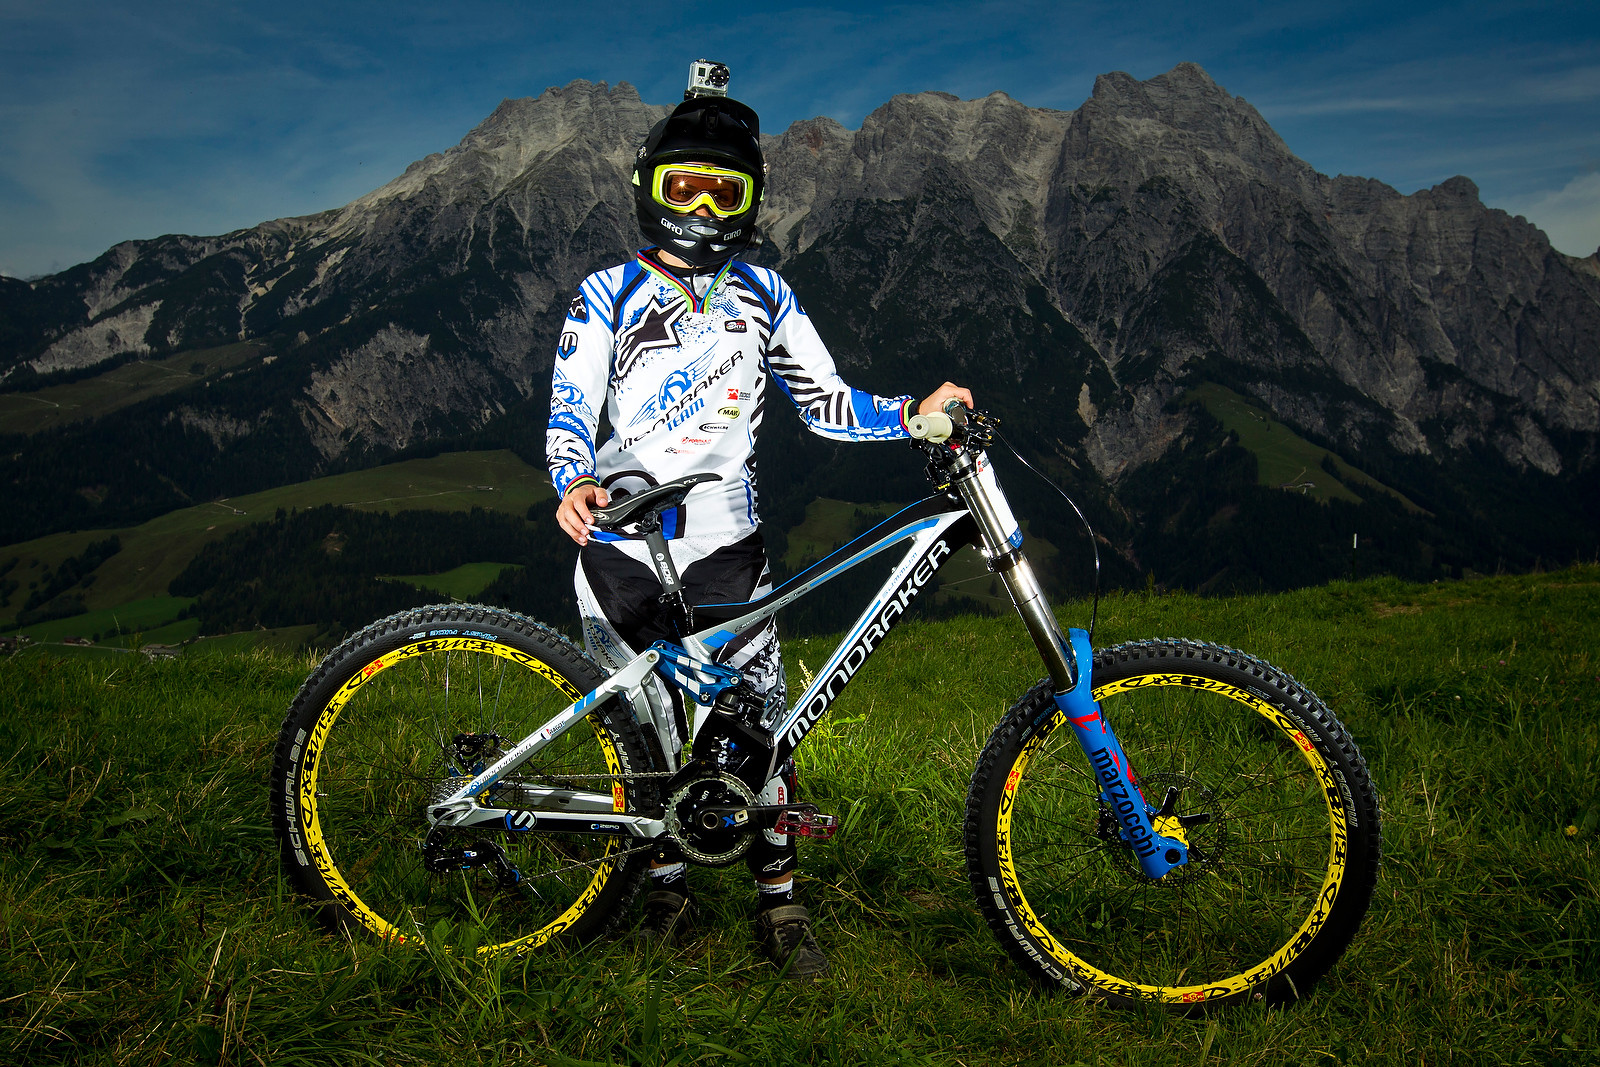 Emmeline Ragot with her Mondraker Summum - World Championships Riders and Bikes - Mountain Biking Pictures - Vital MTB